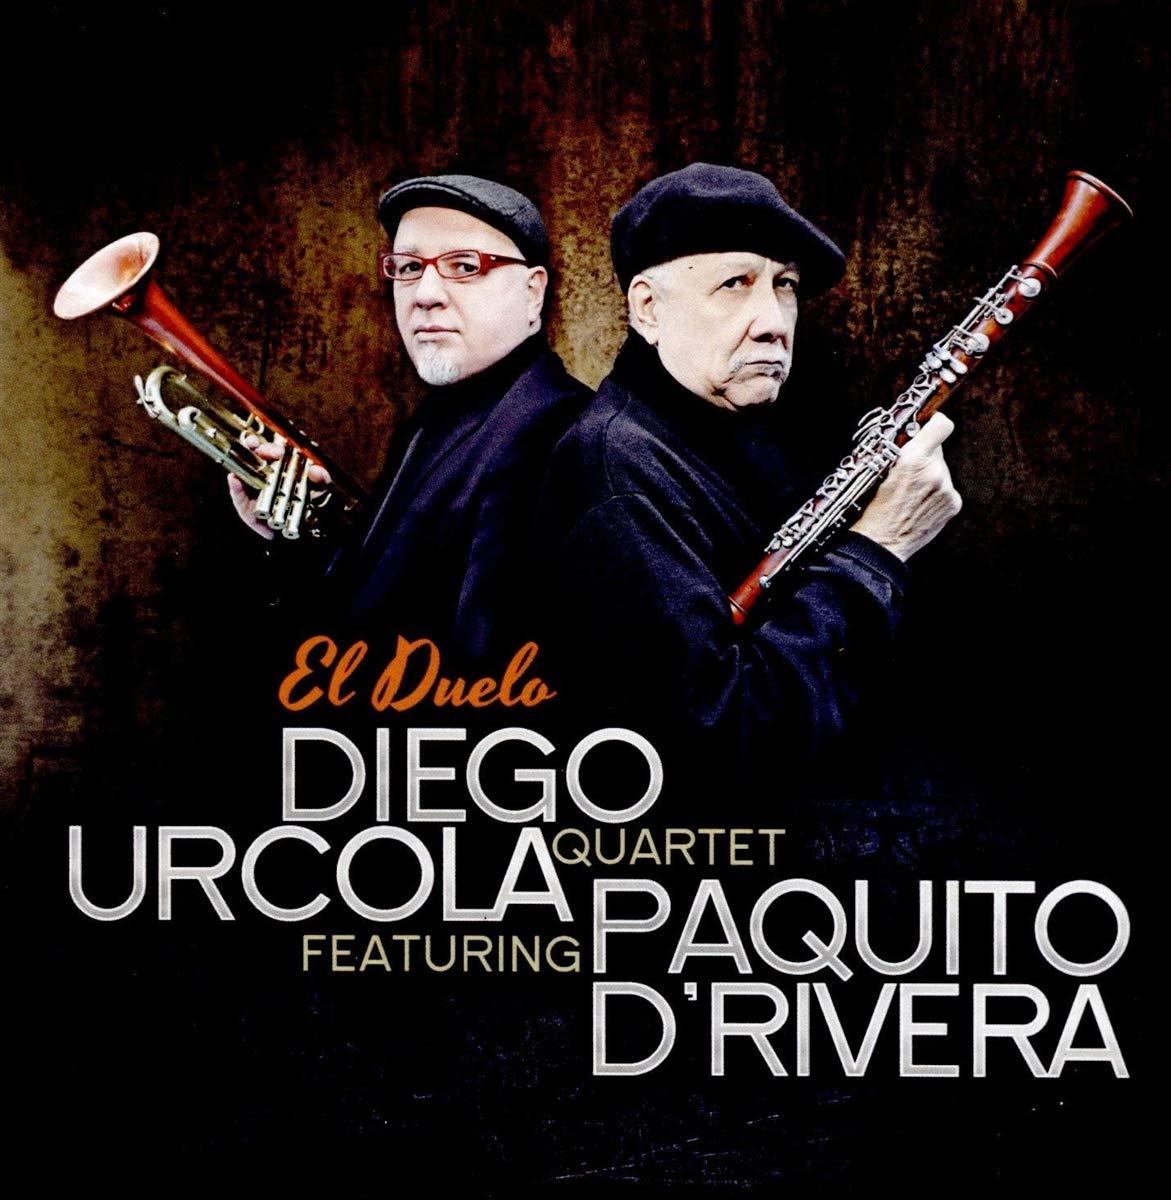 El Duelo Featuring Paquito dRivera